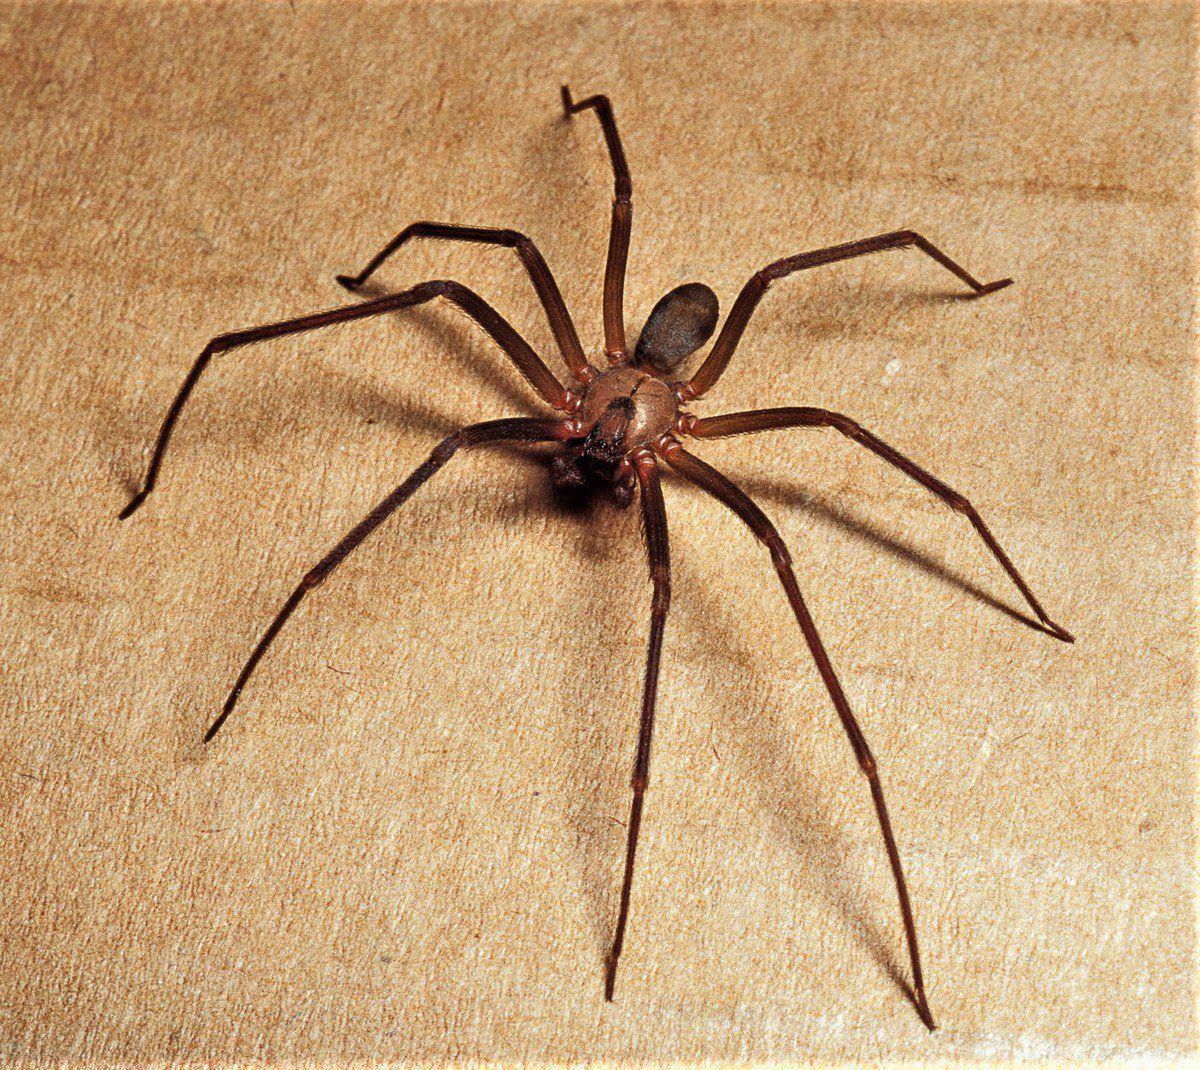 Brown recluses Venomous spiders common here, but little ...